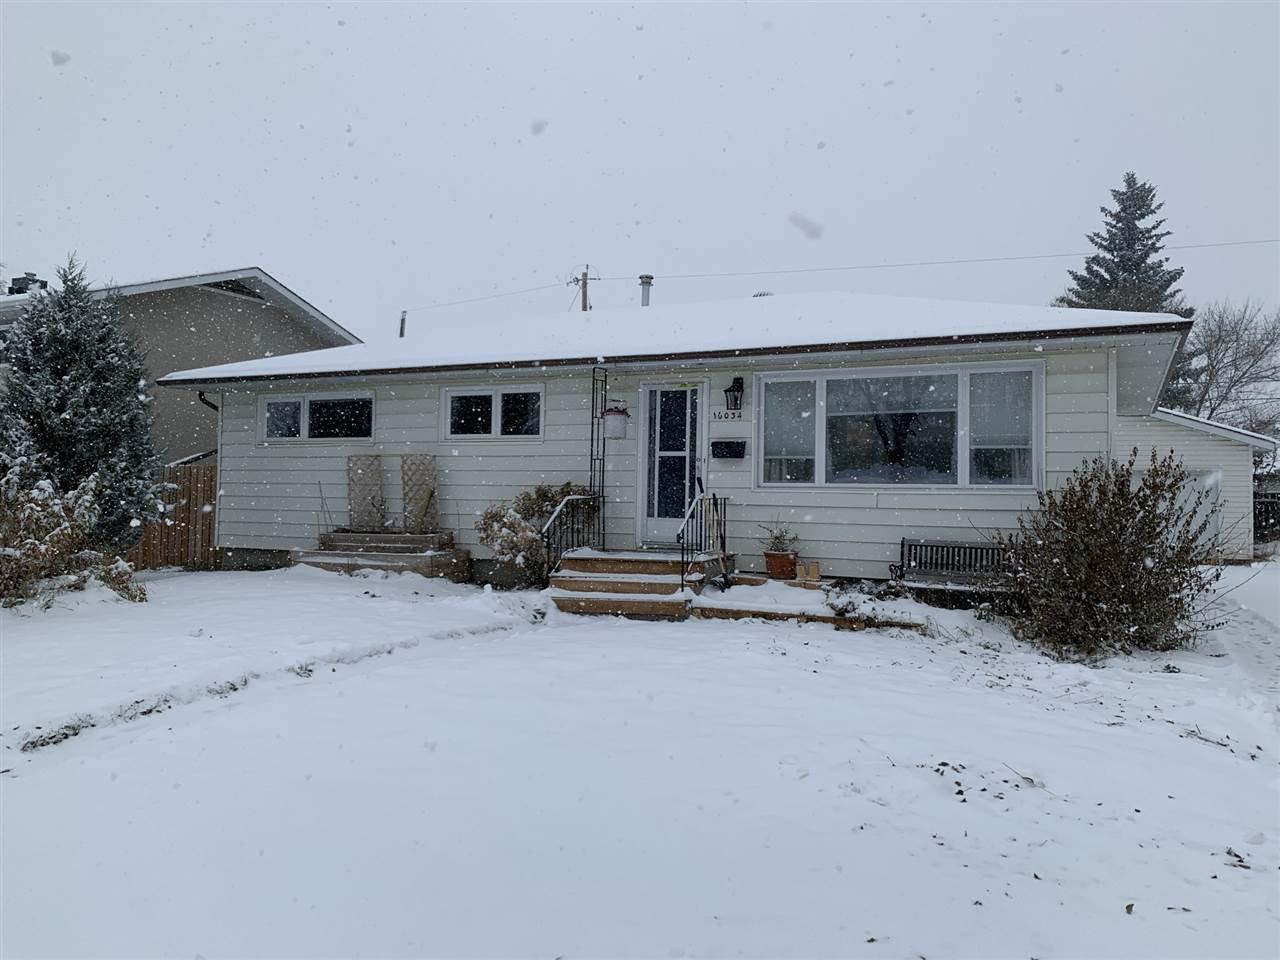 Main Photo: 16034 93 Avenue in Edmonton: Zone 22 House for sale : MLS®# E4220457